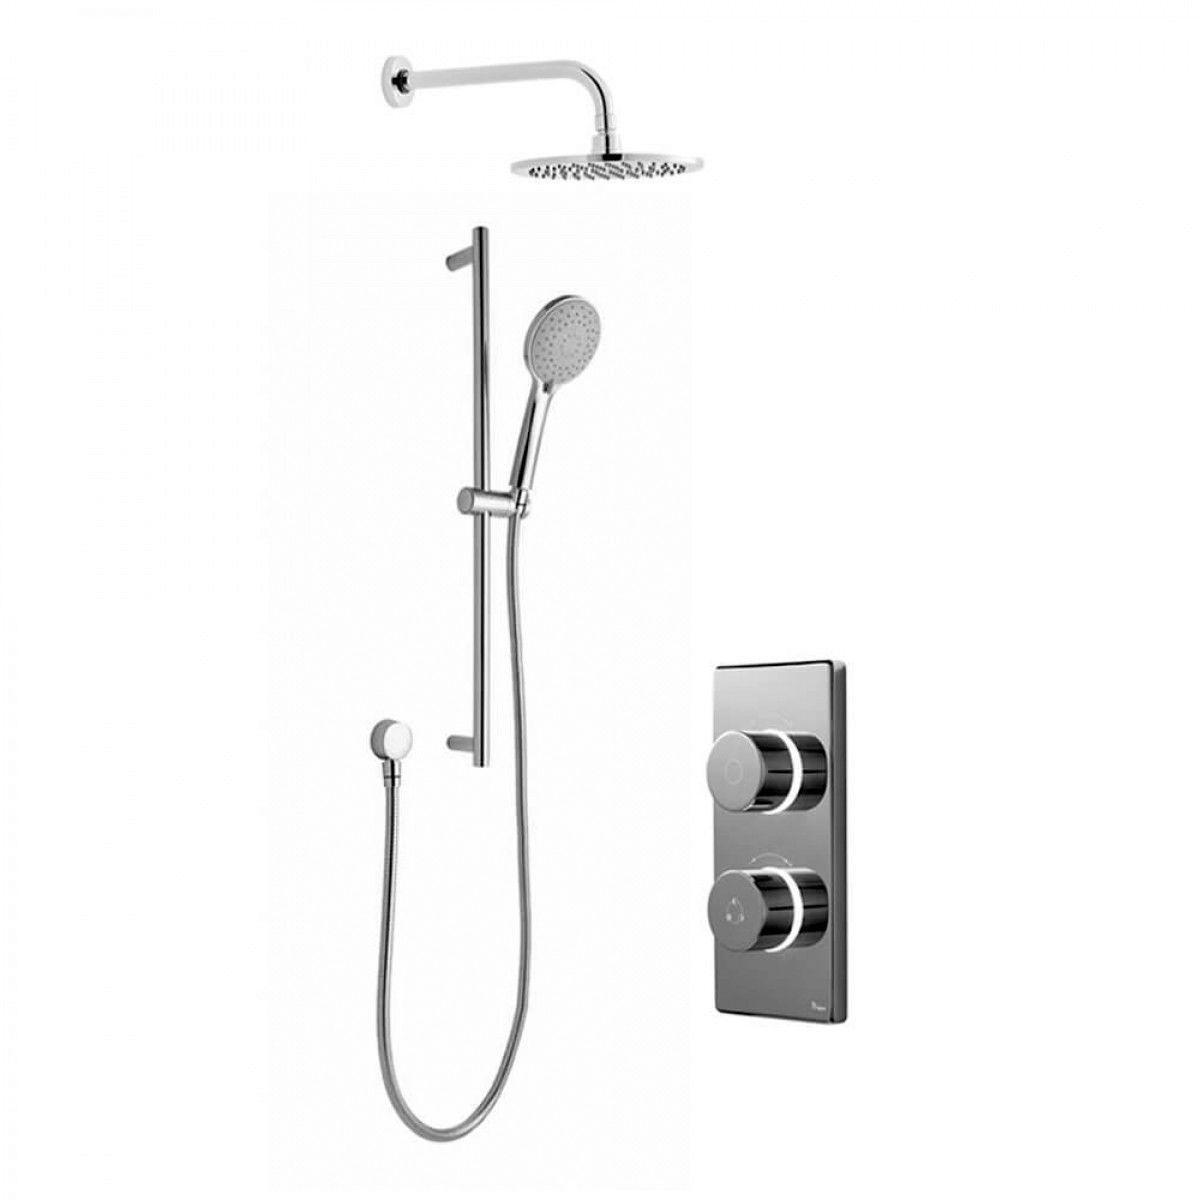 Bathroom Brands Contemporary 2025 Digital Shower Mixer with Wall ...